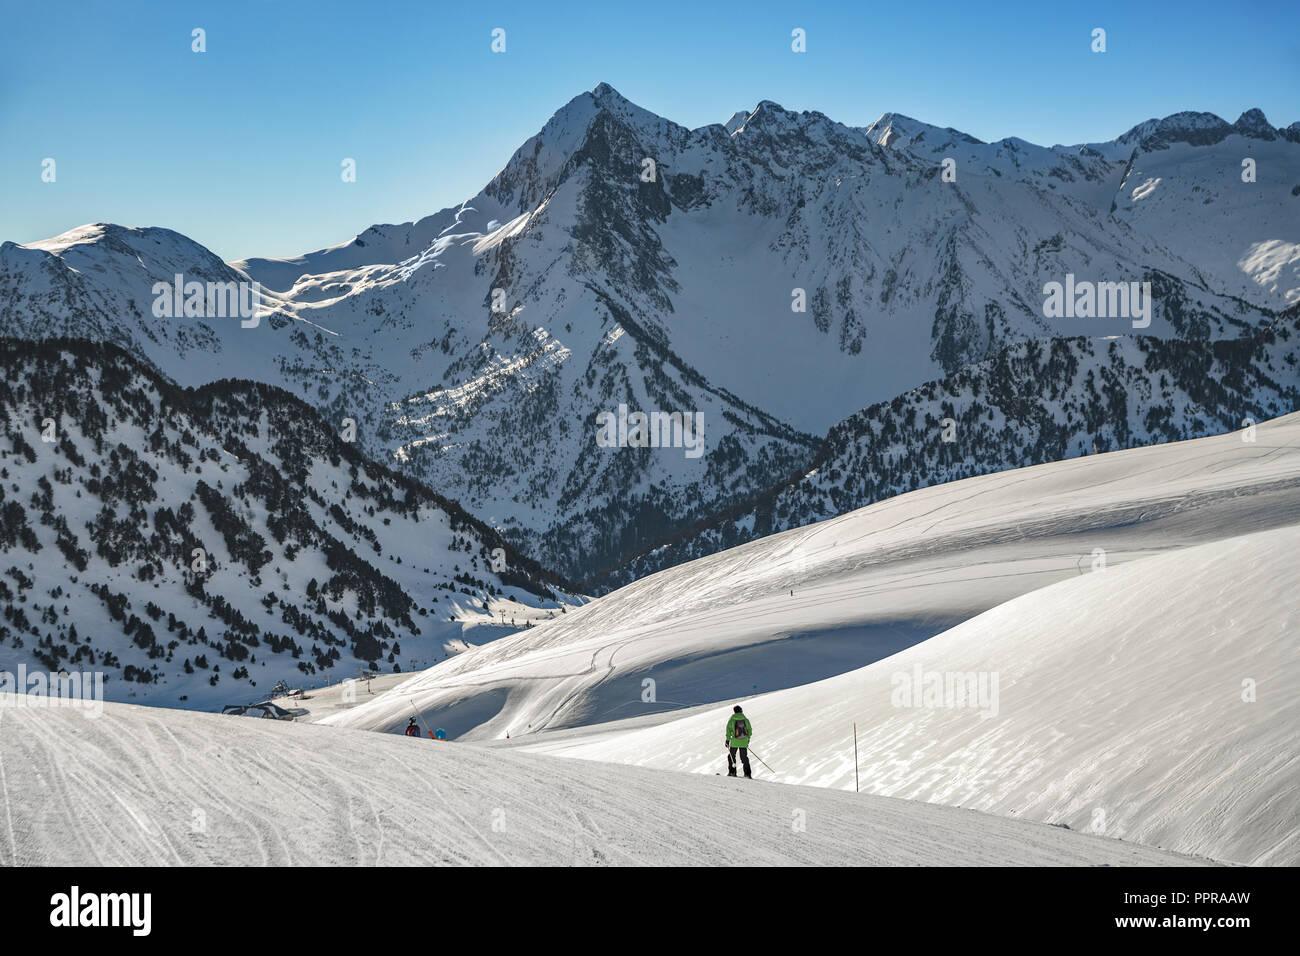 Pla d' Adet ski resort. Saint Lary Soulan. Hautes Pyrenees. France Stock Photo